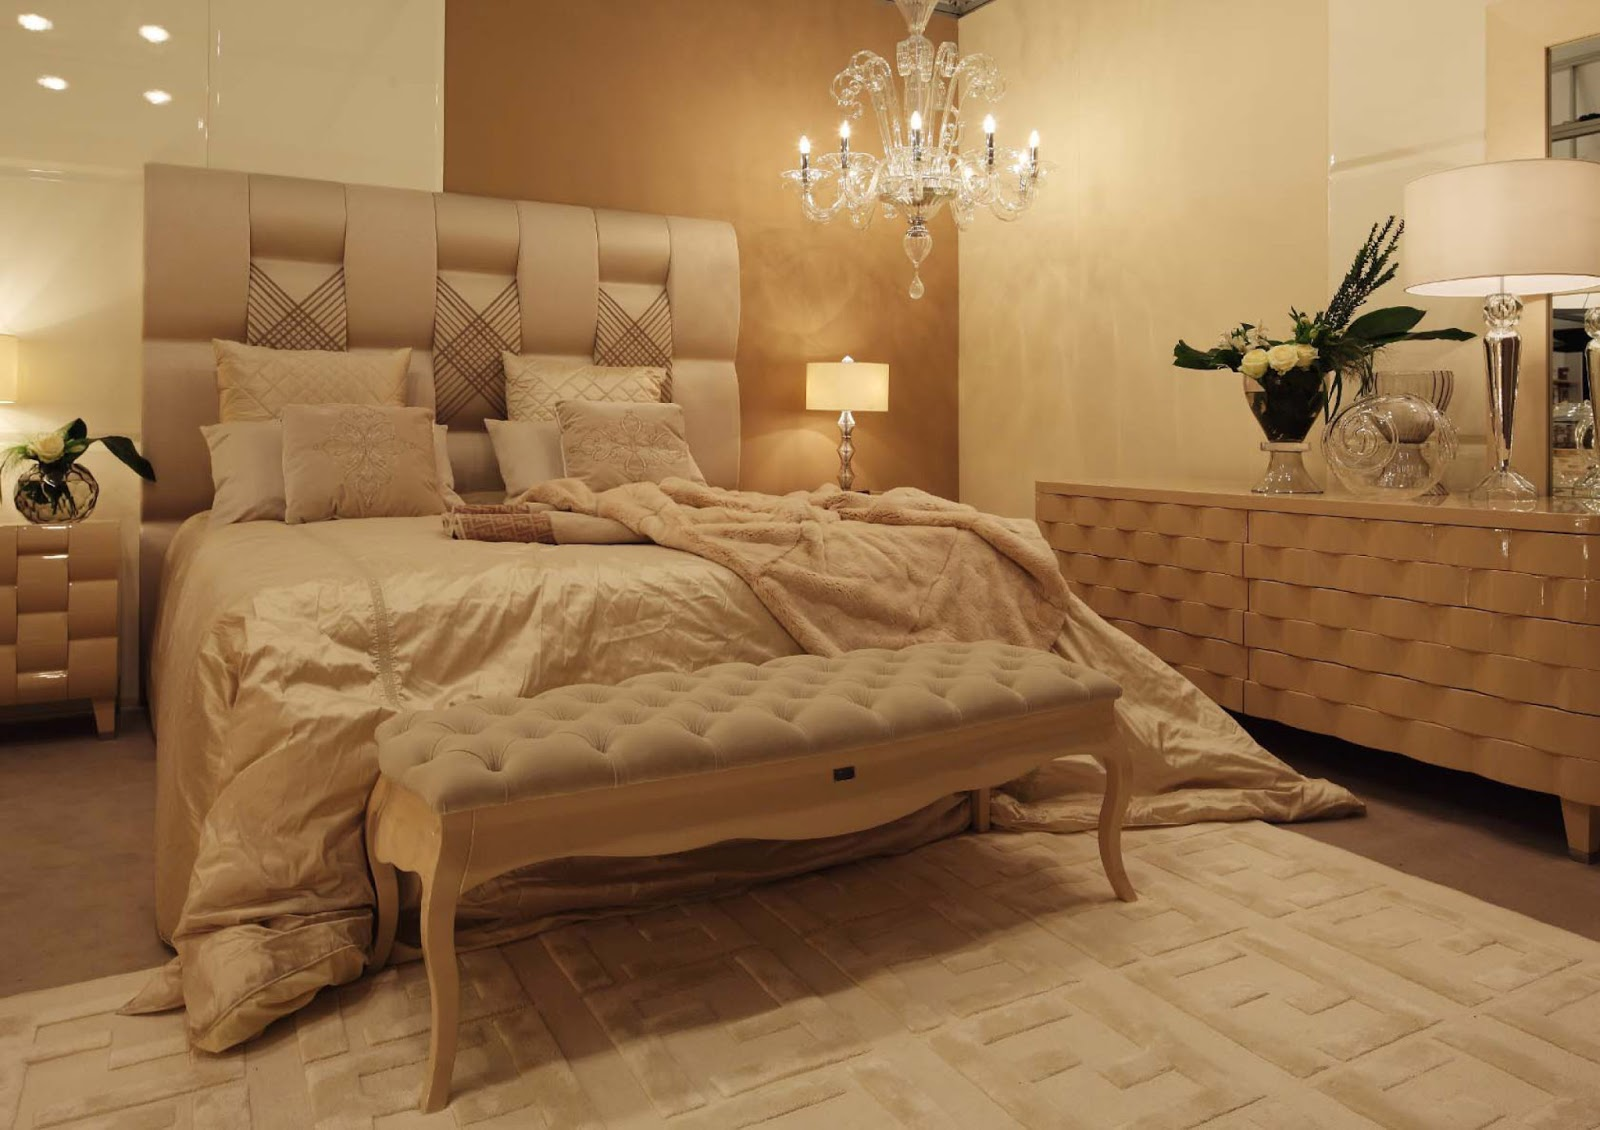 Fernando carrizosa kolbe interior architect marbella for Fendi casa bedroom